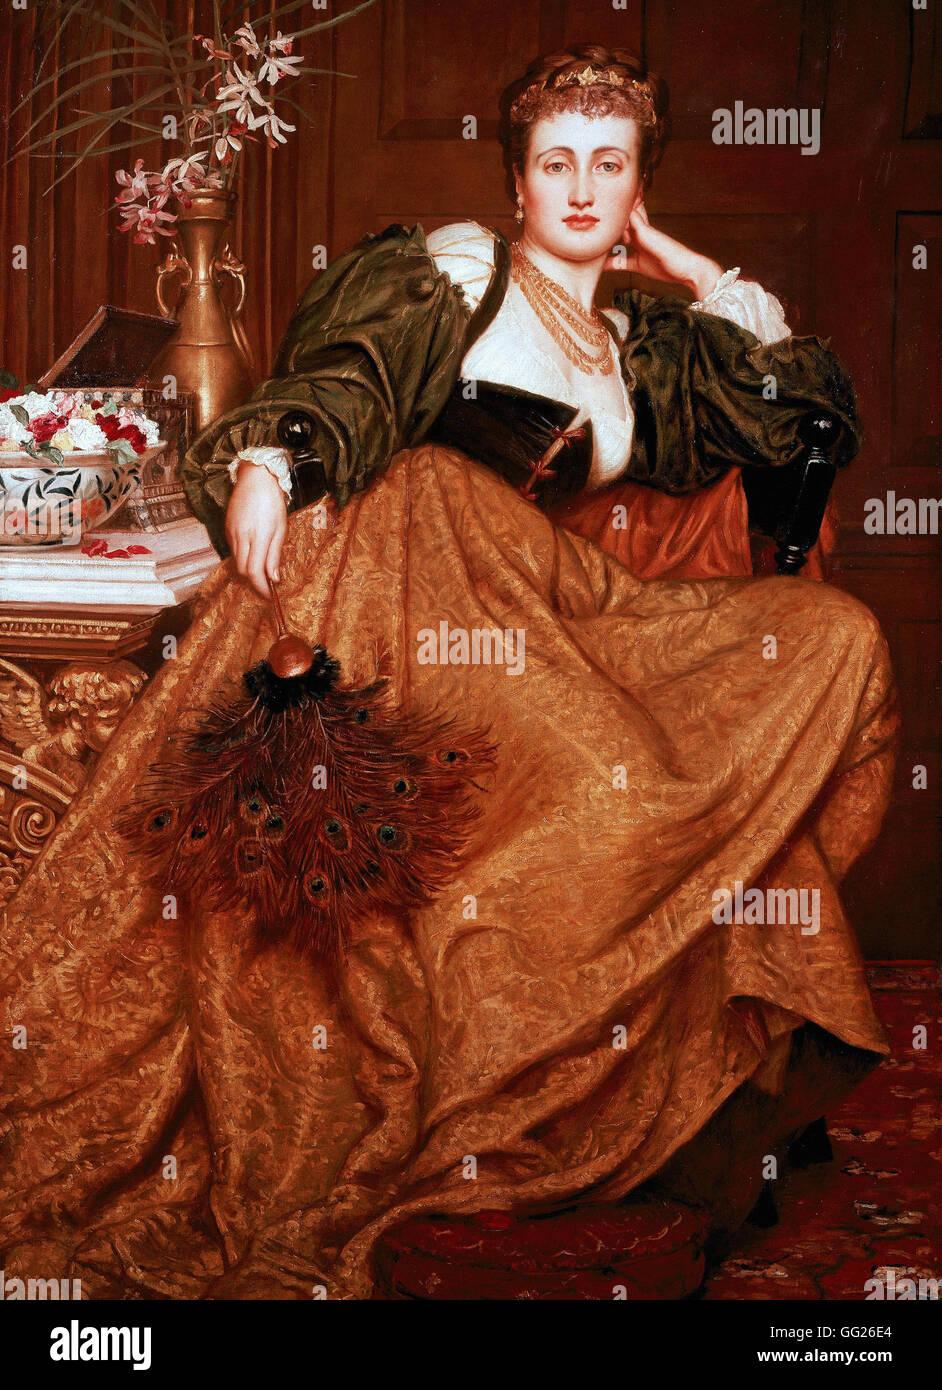 Valentine Cameron Prinsep - Leonora of Mantua - Stock Image